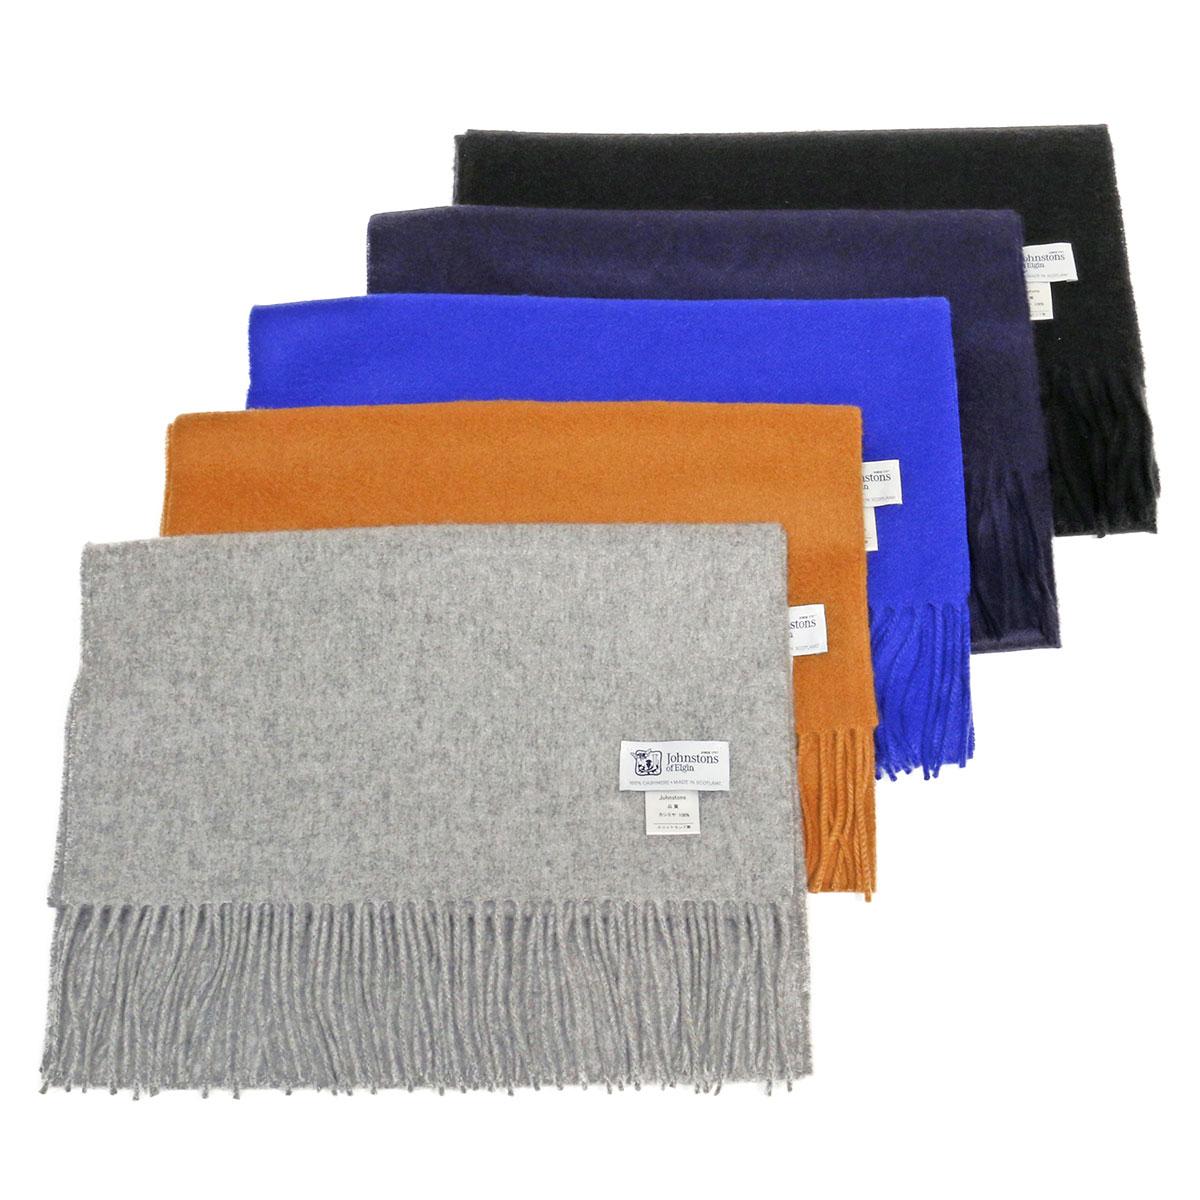 201610_Menz_must-see_muffler_scarf_popular_brand_015